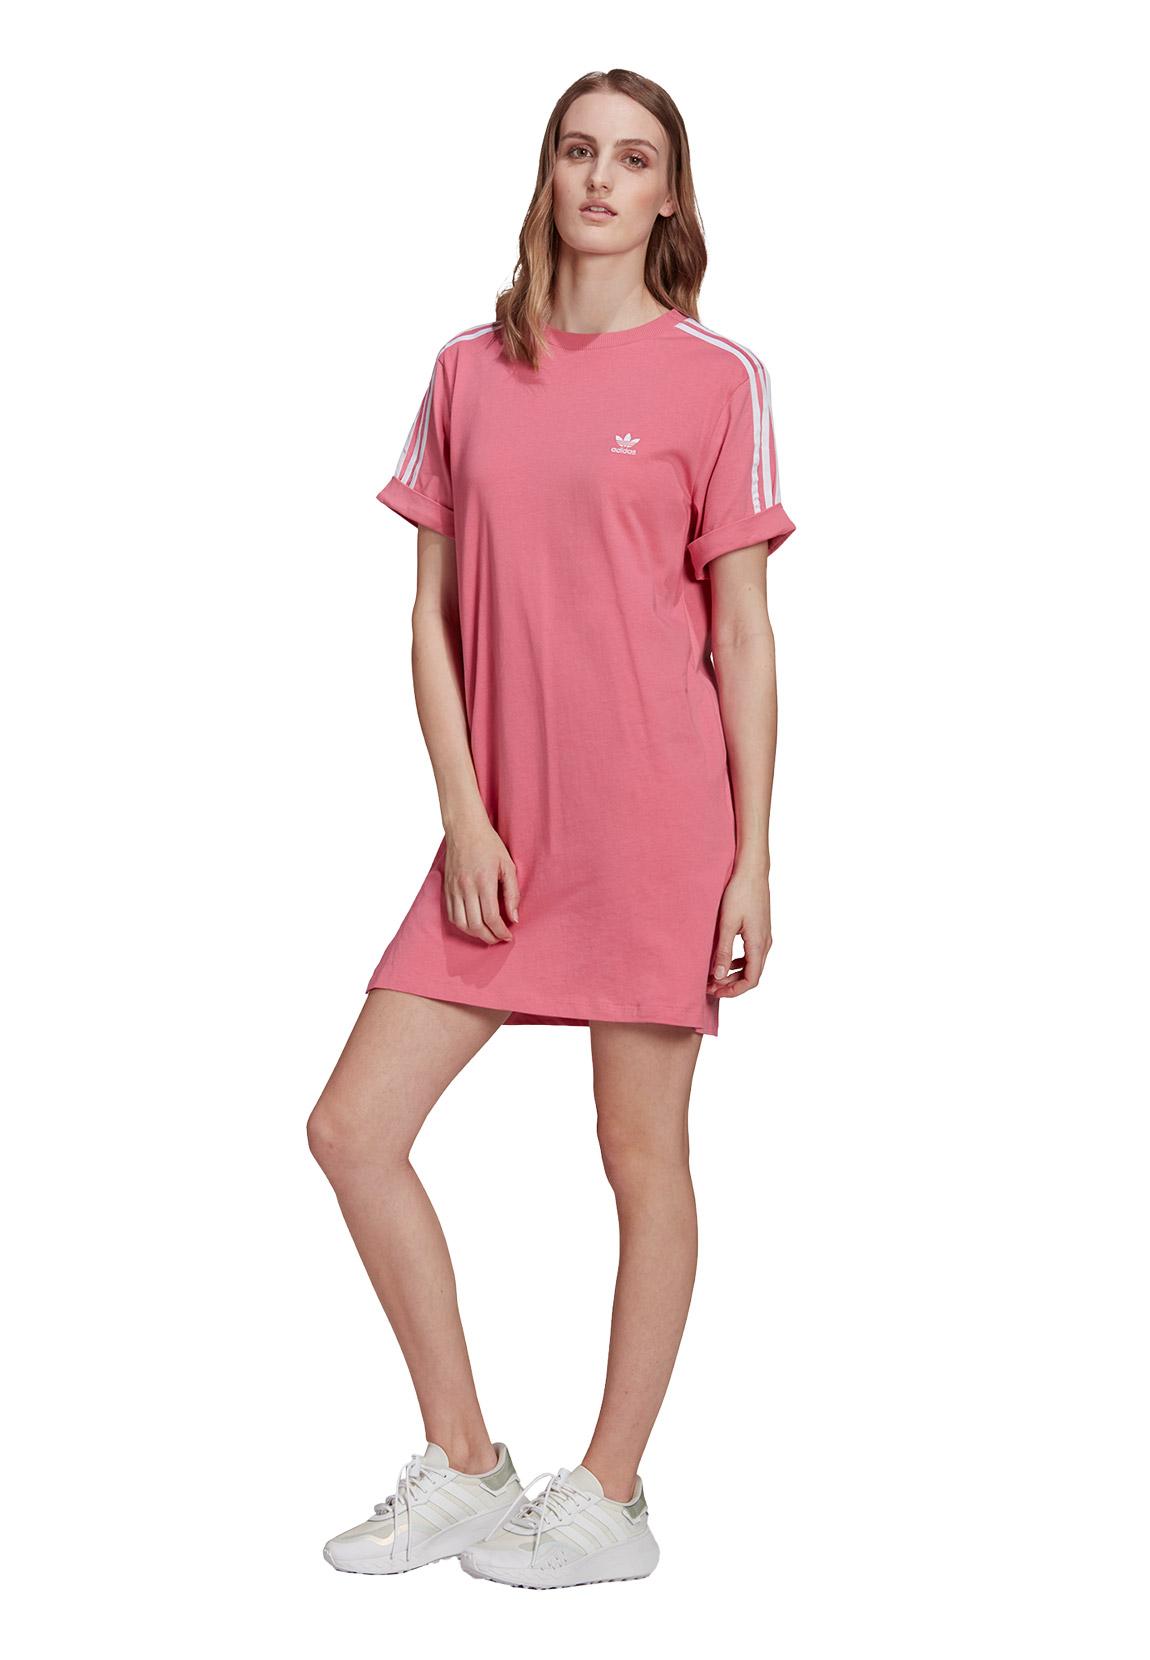 Adidas Originals Damen Kleid TEE DRESS H9 Rosa